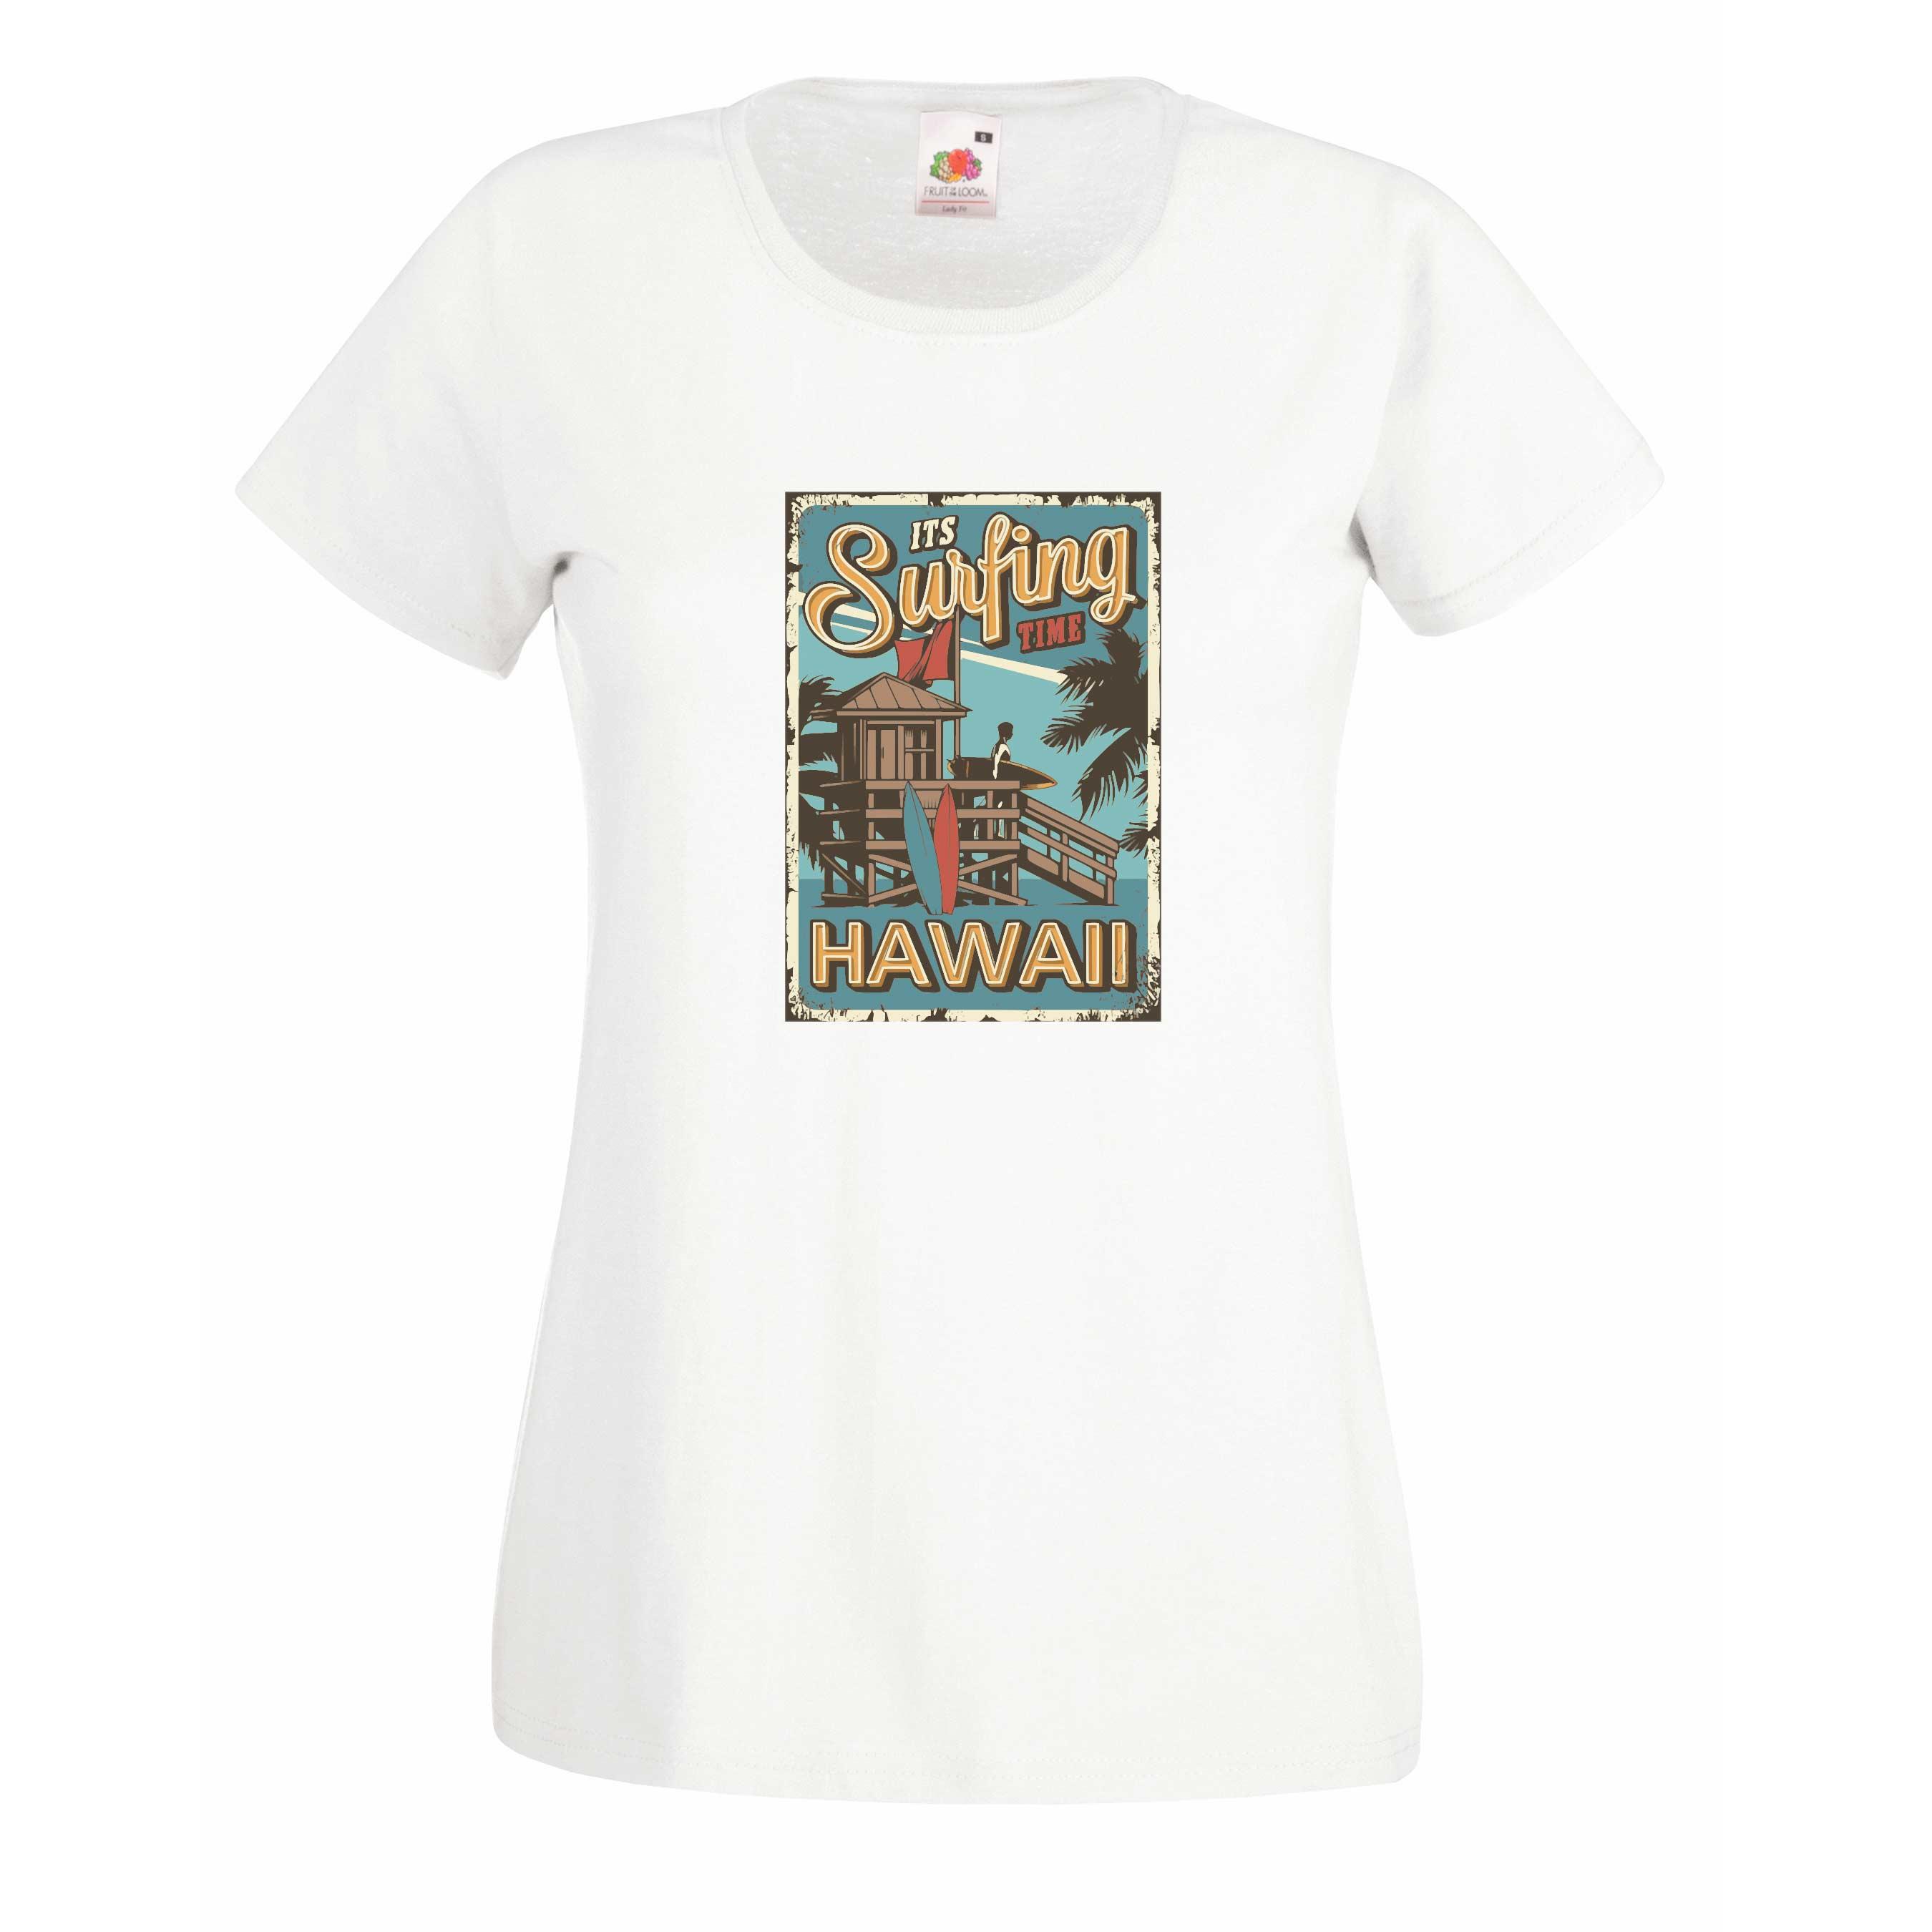 Surfing Time design for t-shirt, hoodie & sweatshirt